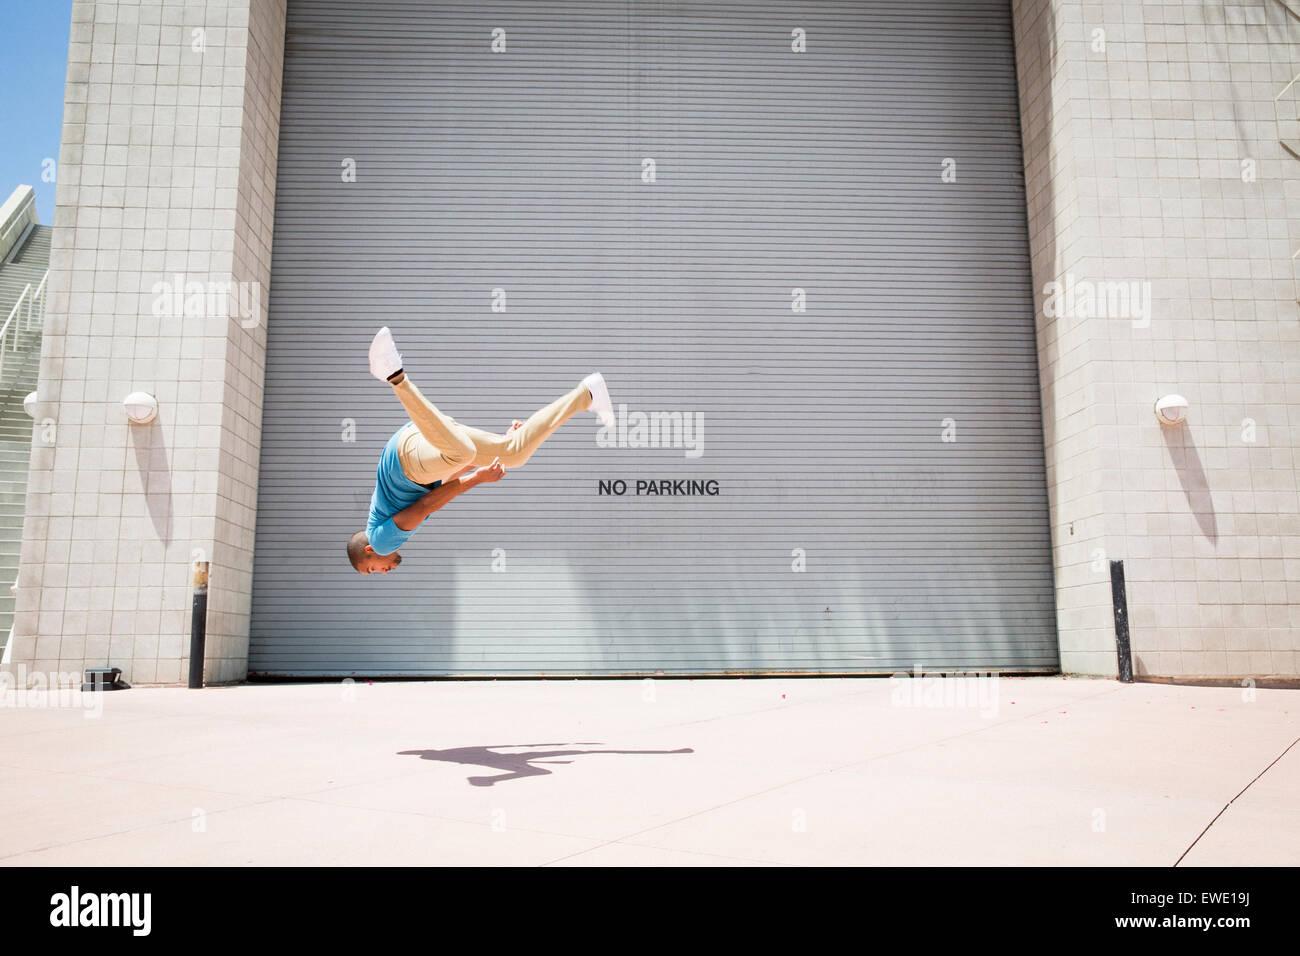 Junger Mann Saltos auf street Parcour Parkour freilaufend Stockbild